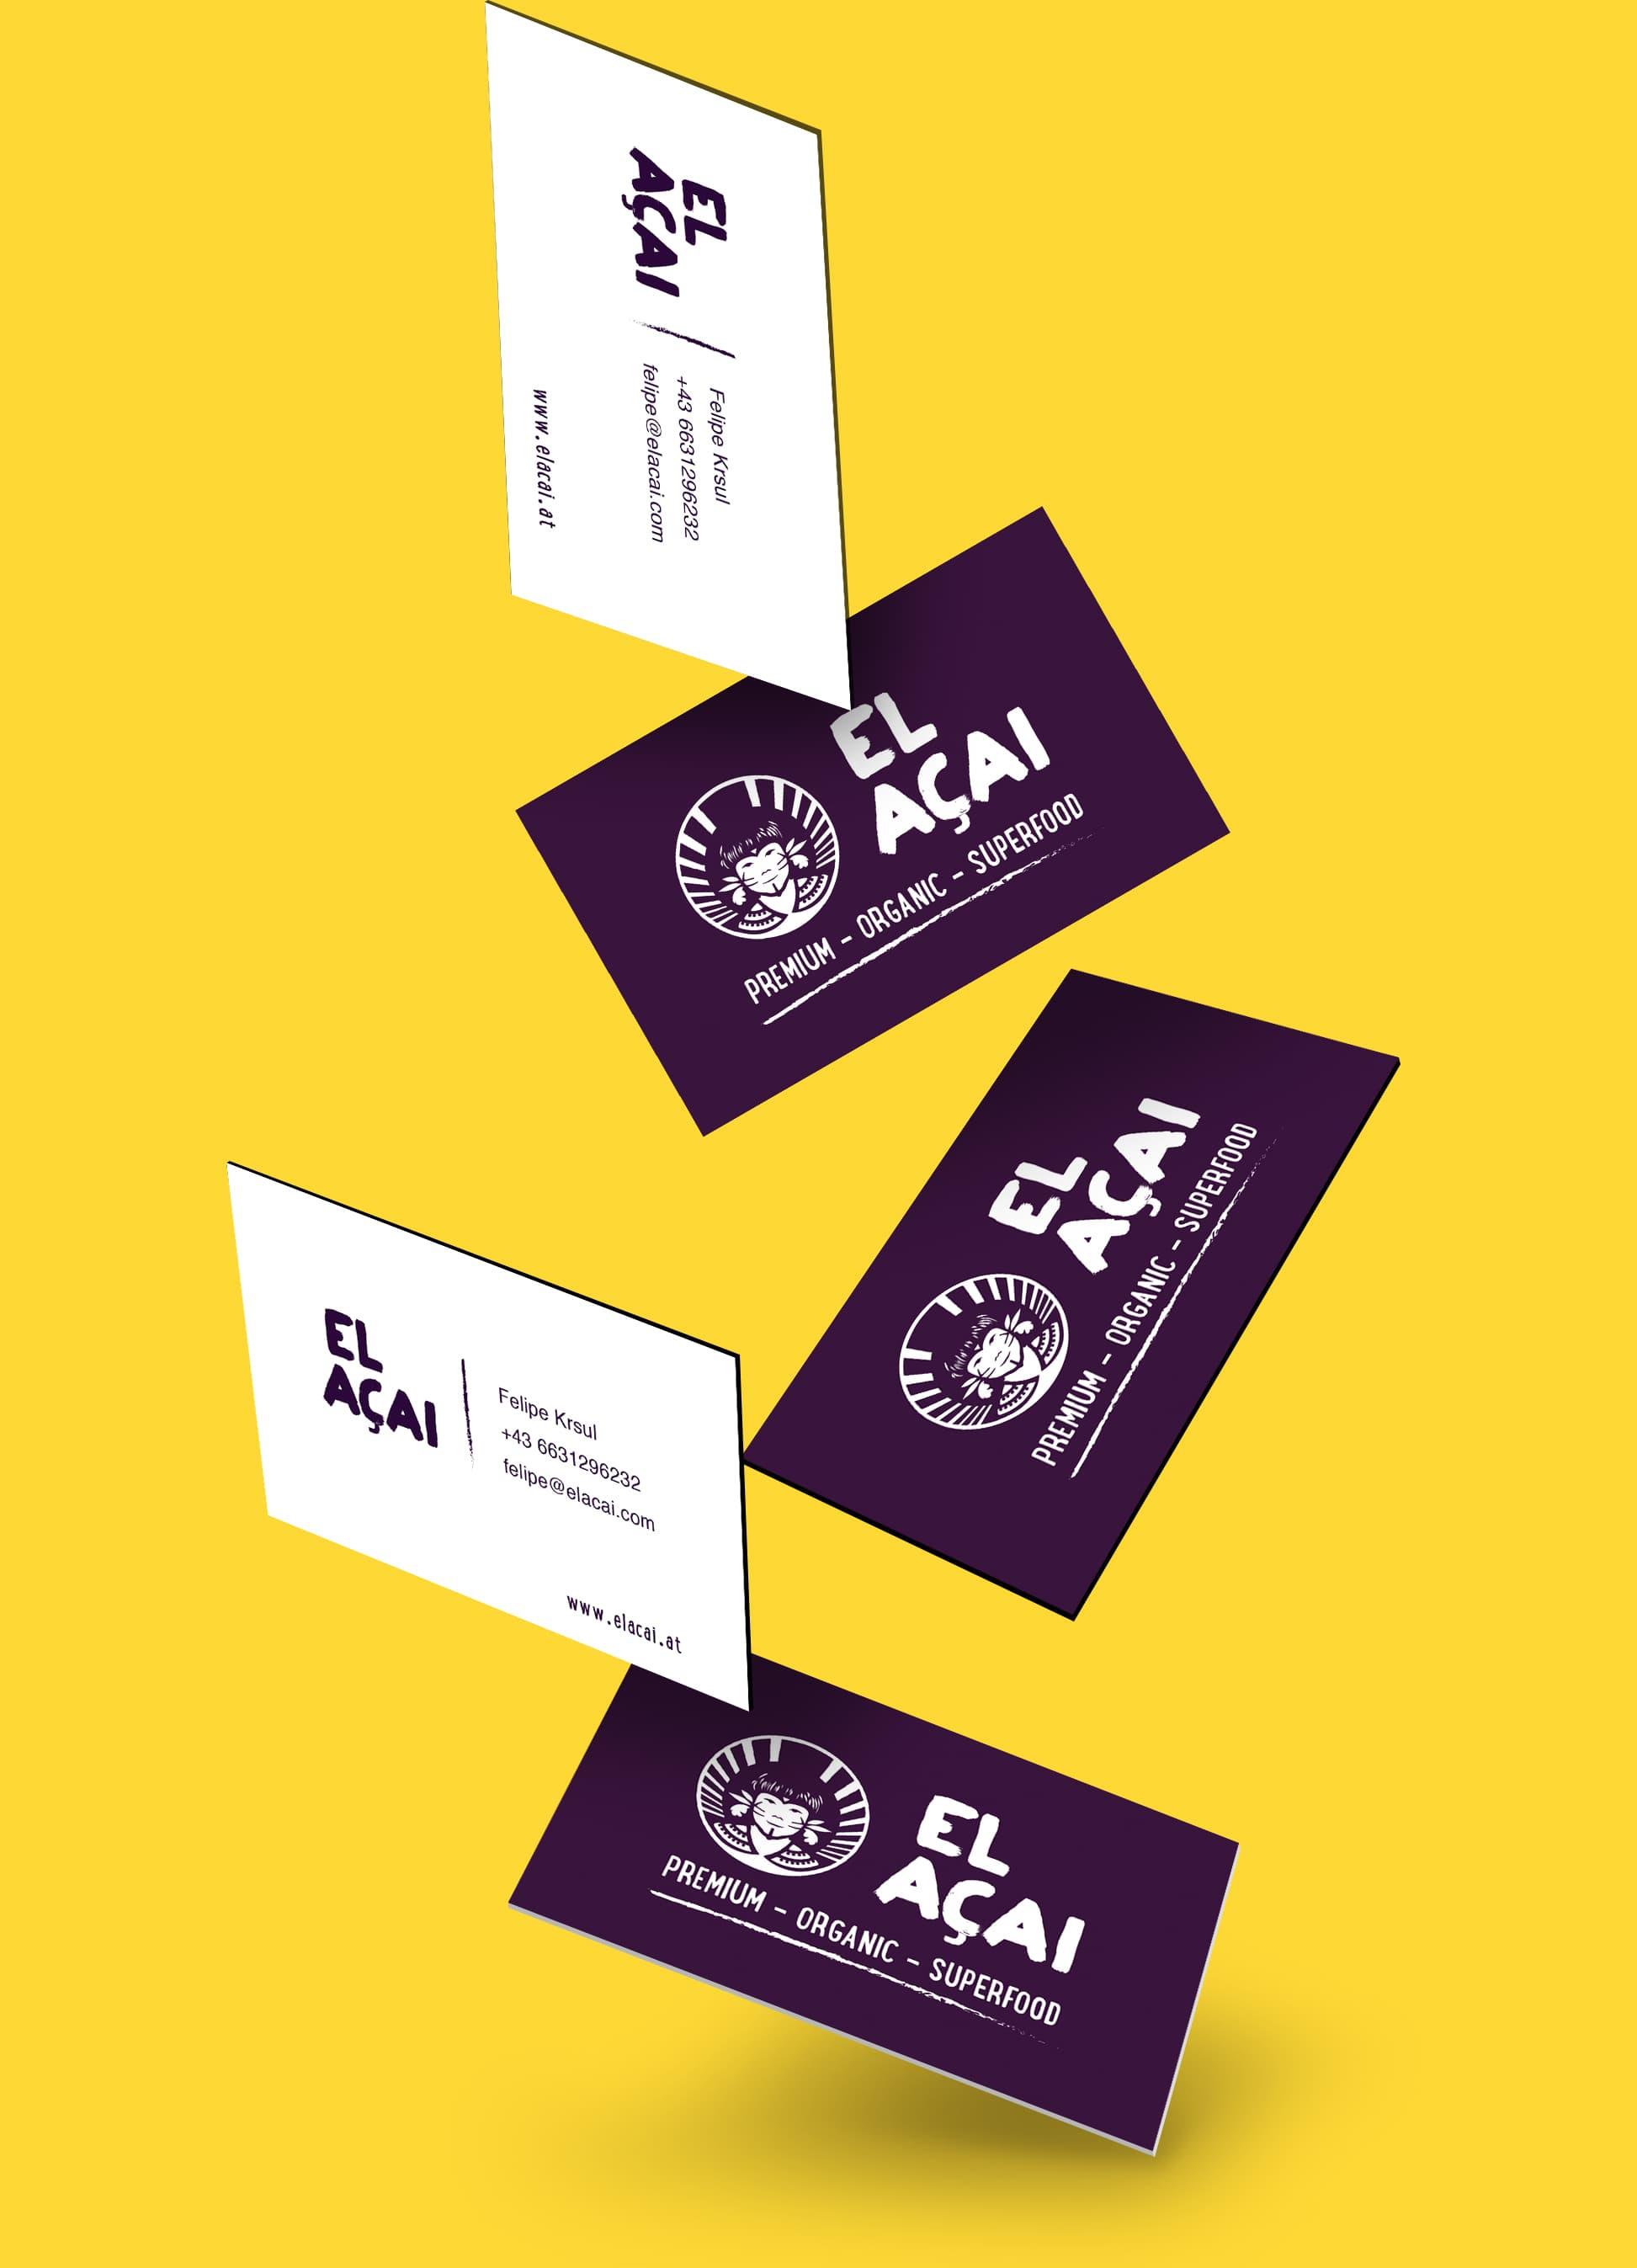 El Acai Europe Business Cards